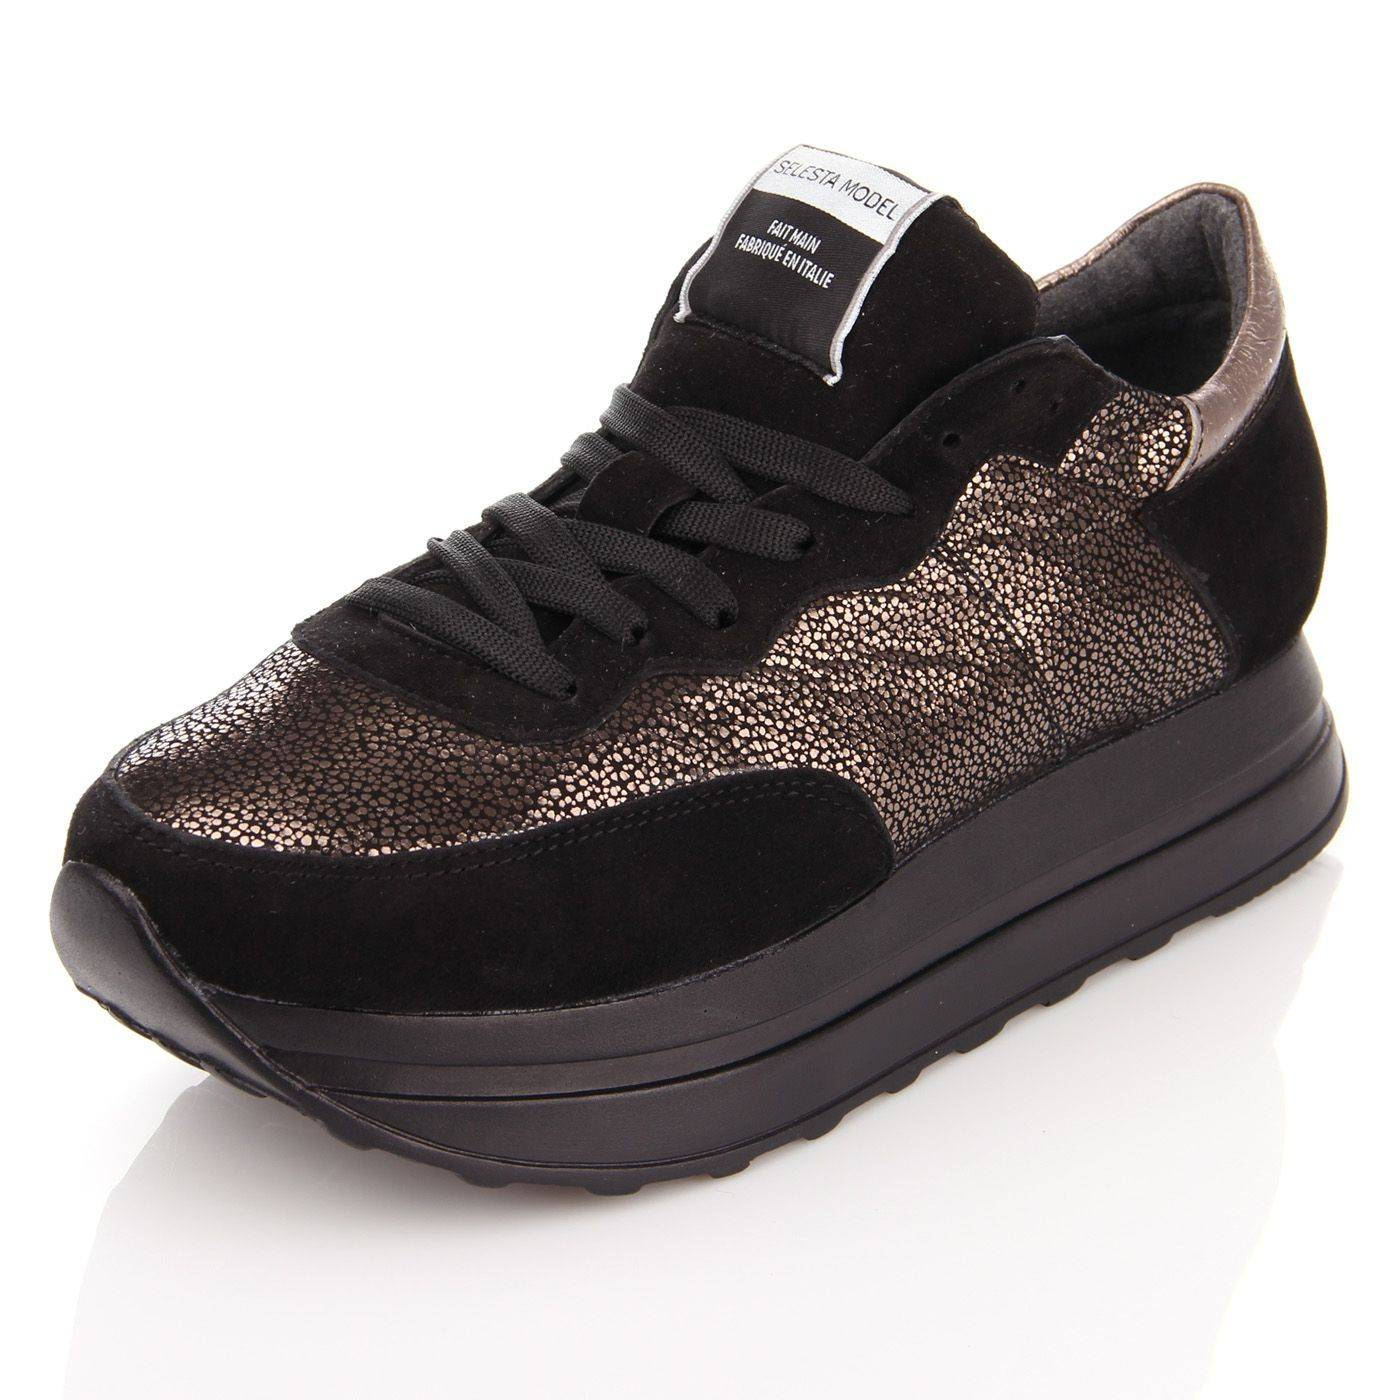 Кросівки жіночі Selesta 4265 Чорний купить по выгодной цене в ... 5c7fdeb253bed